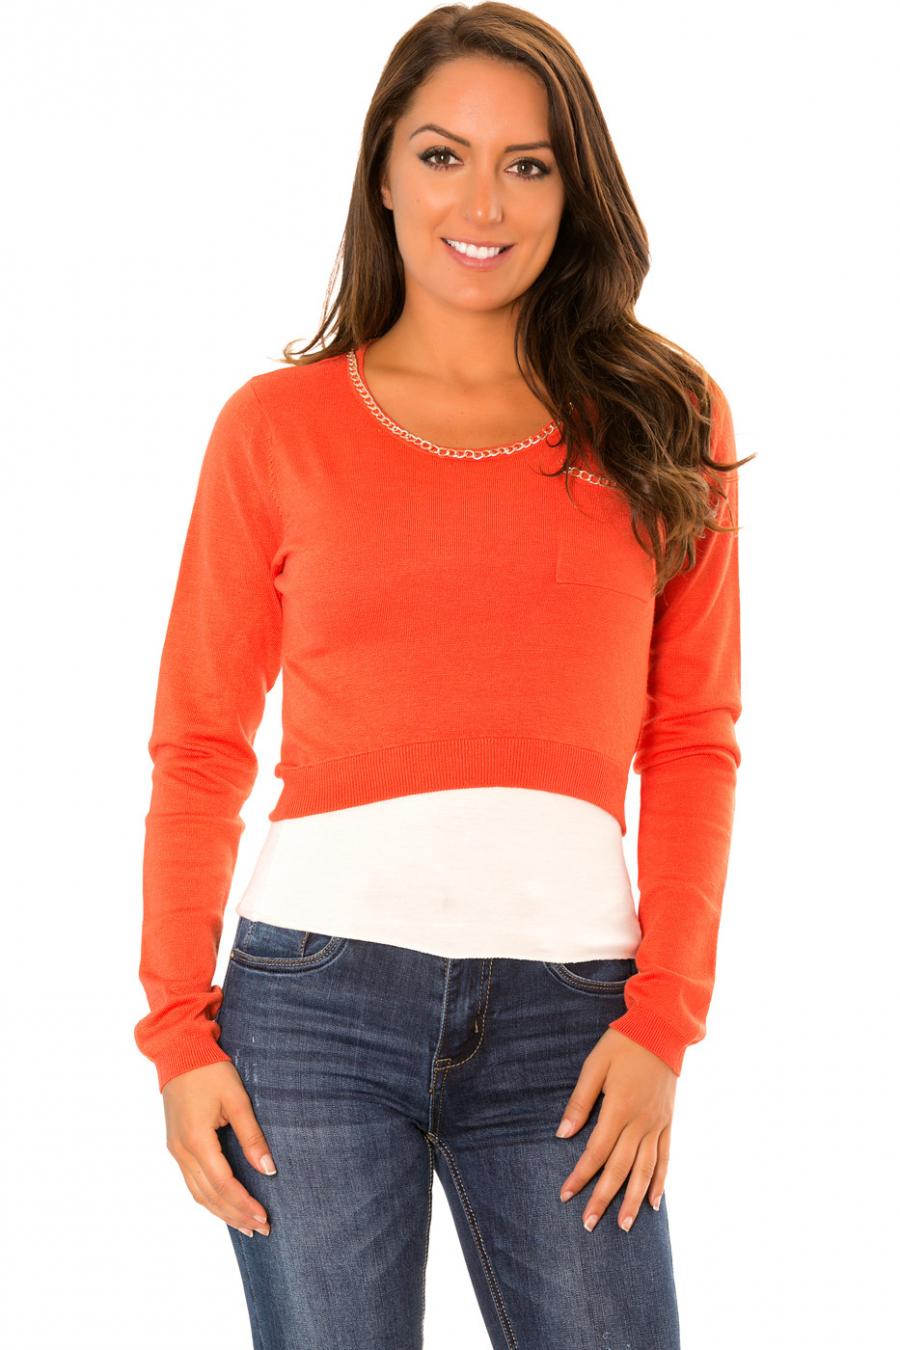 Pull crop top Orange poches et encolure fantaisie. PU-892